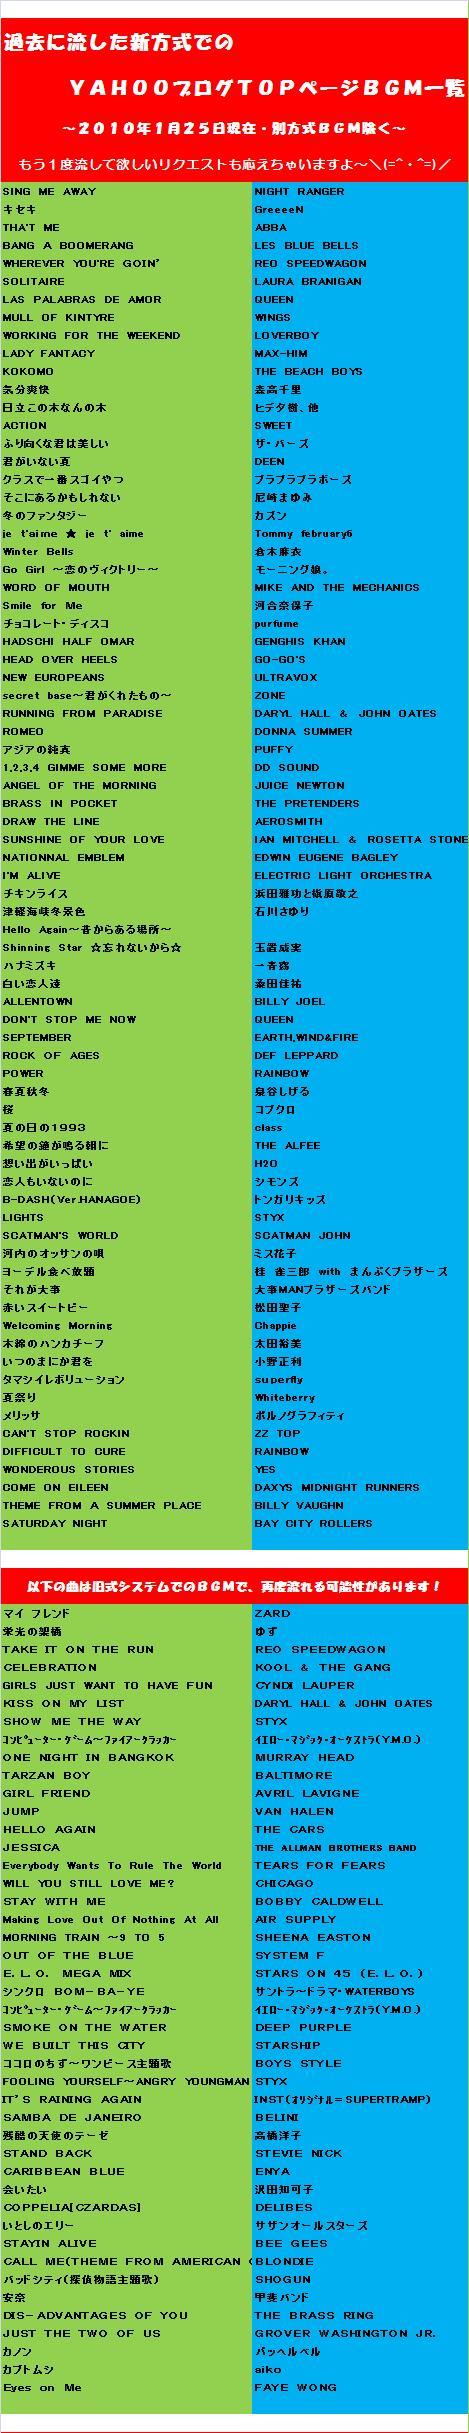 20110125・YAHOOブログBGM過去一覧.jpg